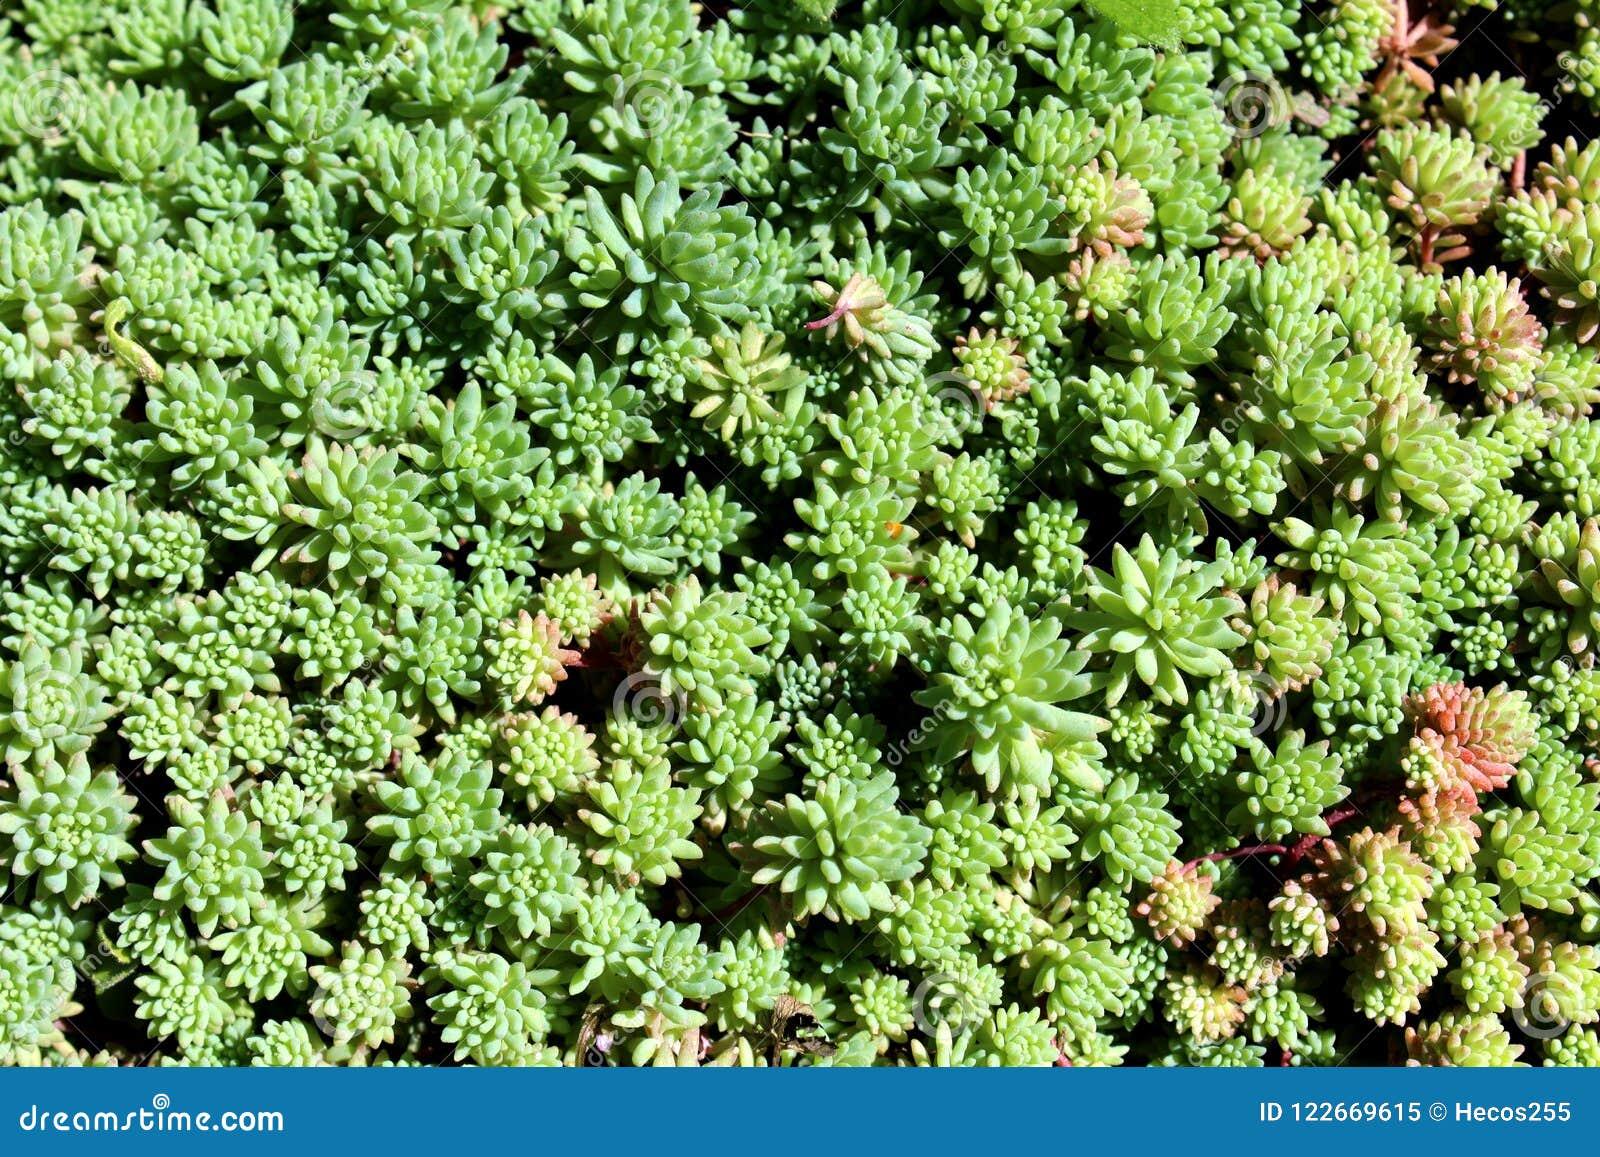 Sedum Or Stonecrop Hardy Succulent Ground Cover Perennial Green